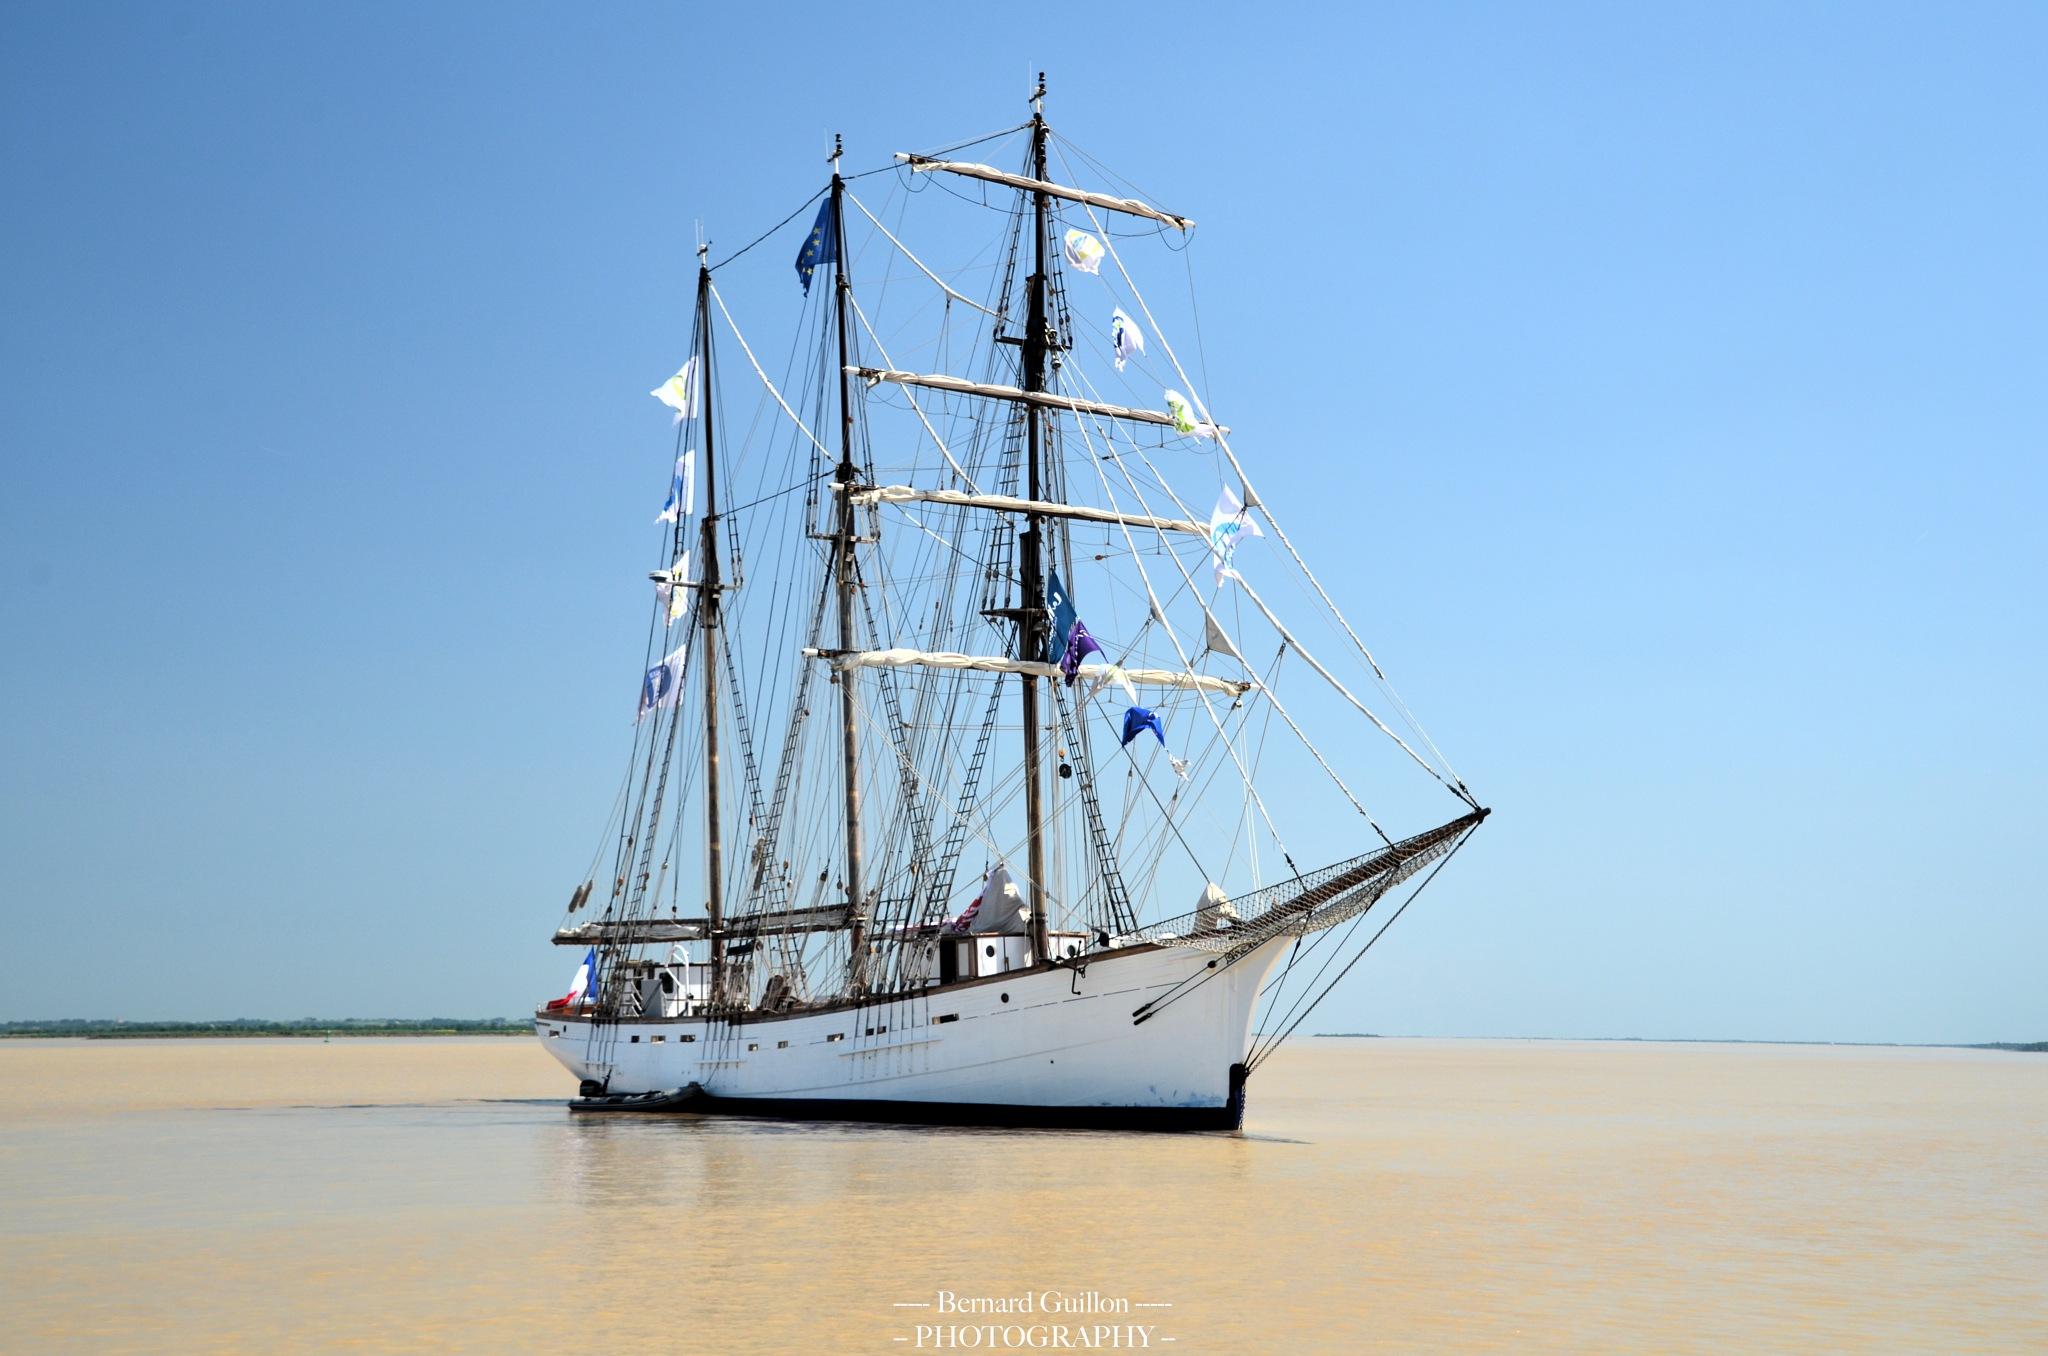 The french vessel Marité by Bernard Guillon